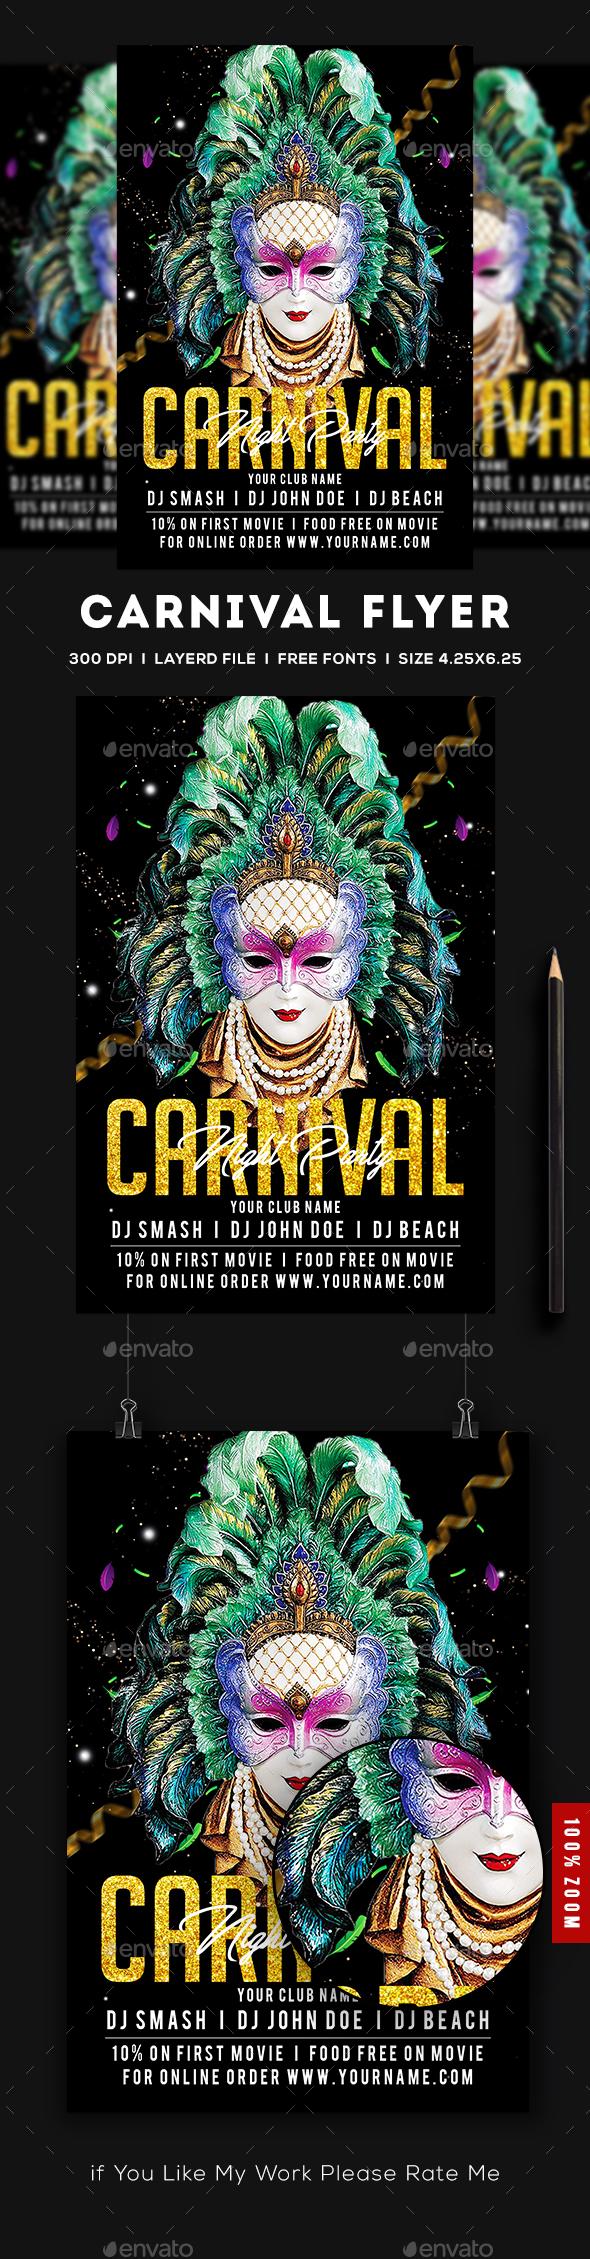 Carnival Flyer - Flyers Print Templates